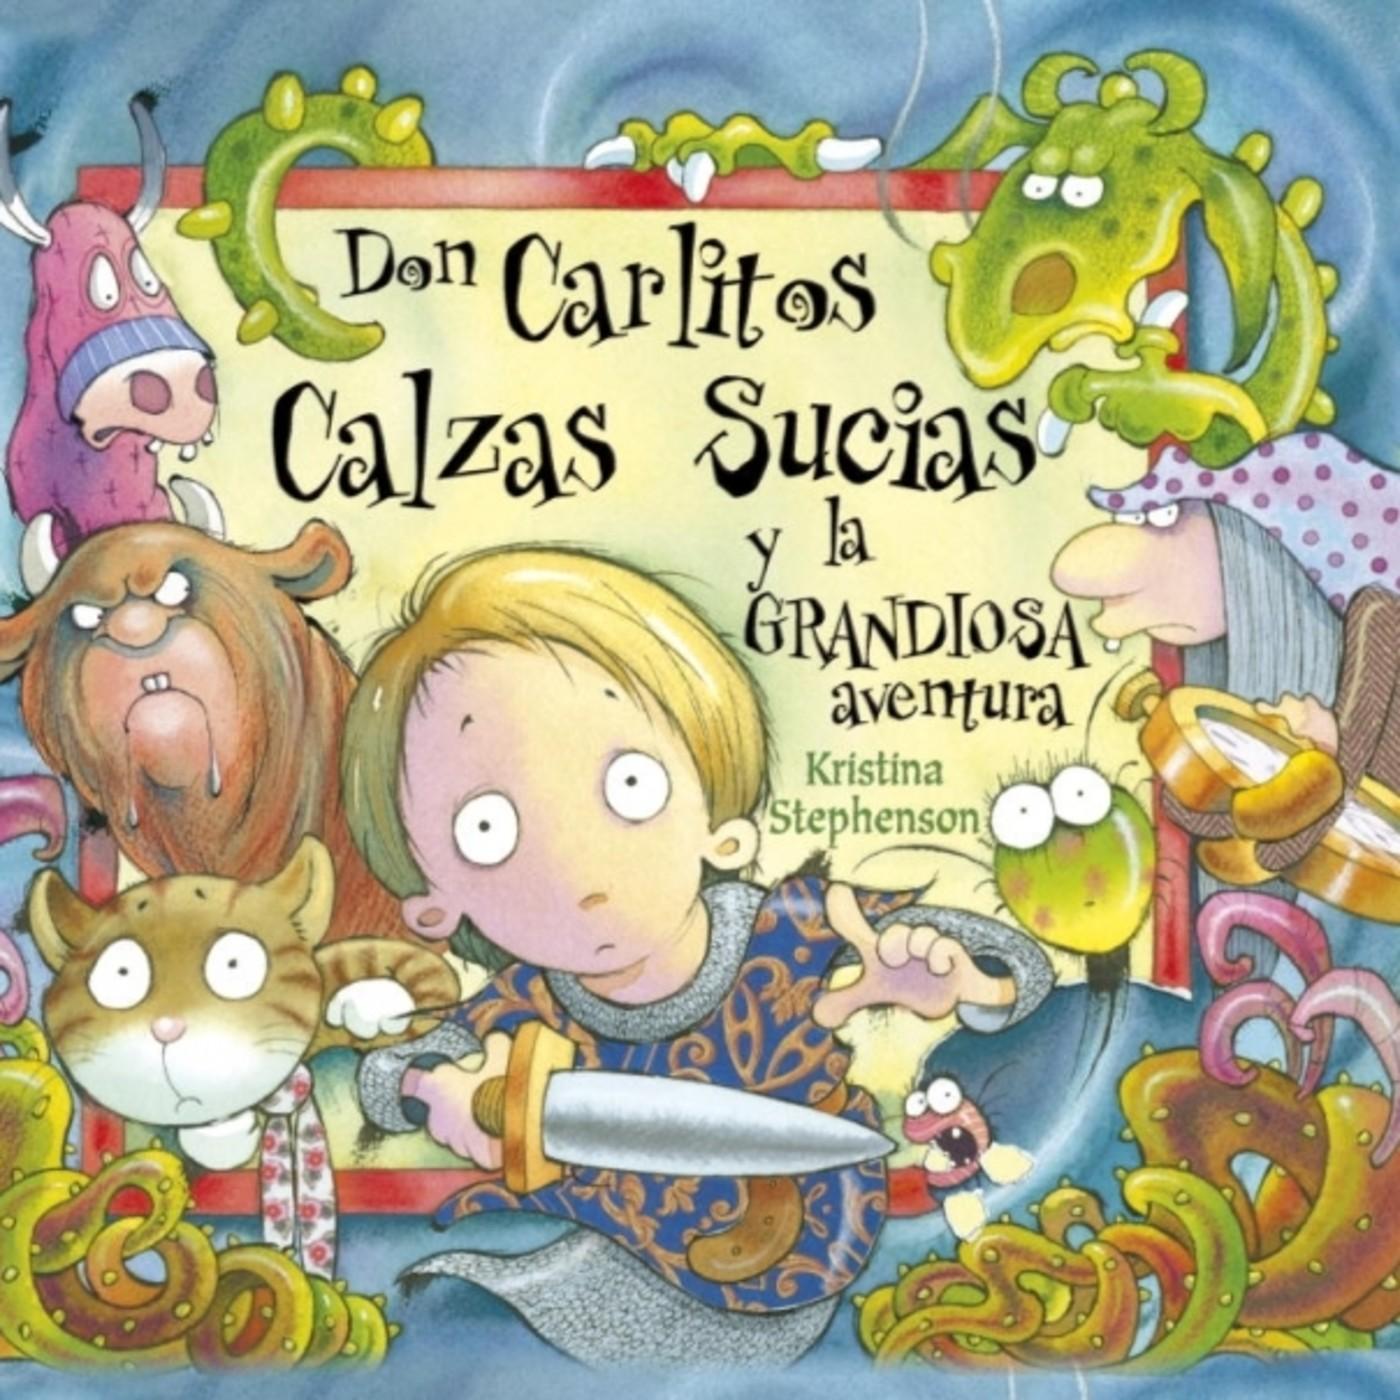 Don Carlitos Calzas Sucias y la grandiosa aventura. Kristina Stephenson